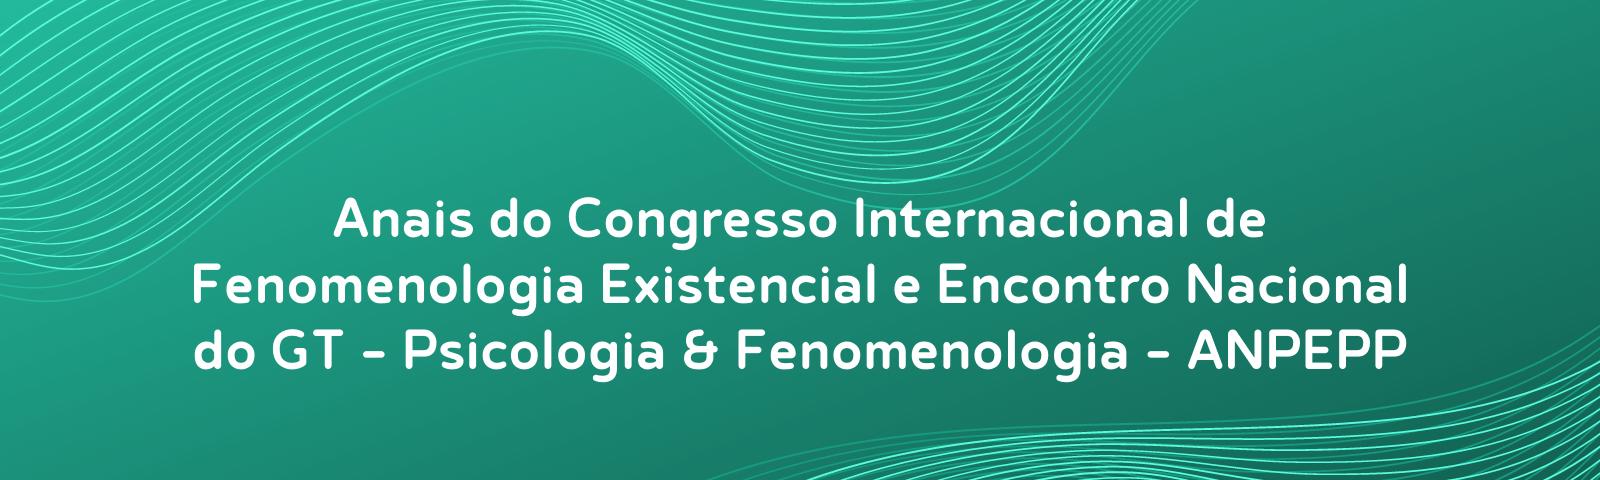 Anais do Congresso Internacional de Fenomenologia Existencial e Encontro Nacional do GT Psicologia & Fenomenologia - ANPEPP